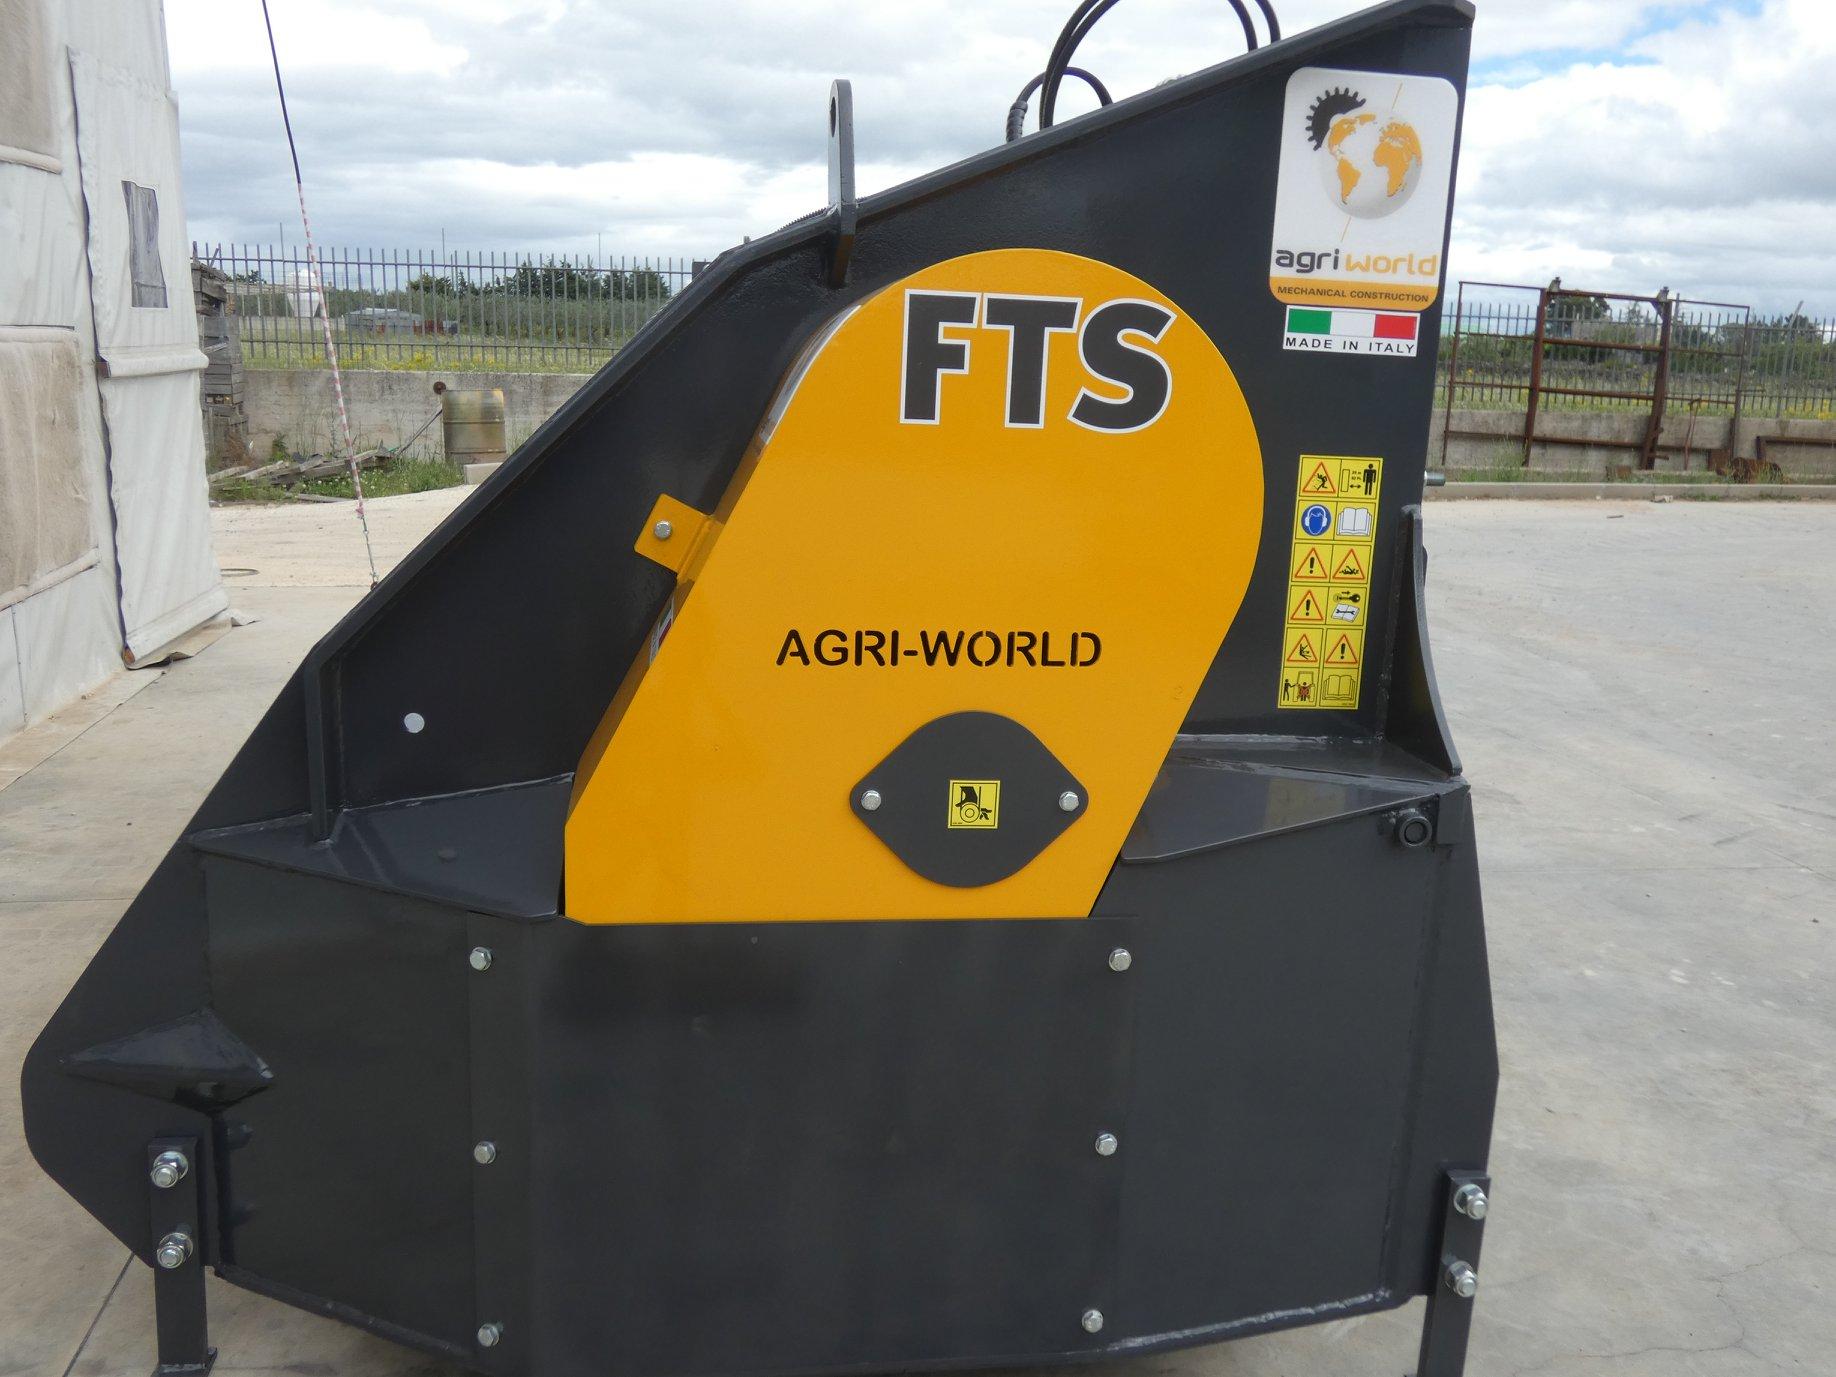 AgriWorld Trituradora de Piedras FTS 200.02 AgriWorld - 2